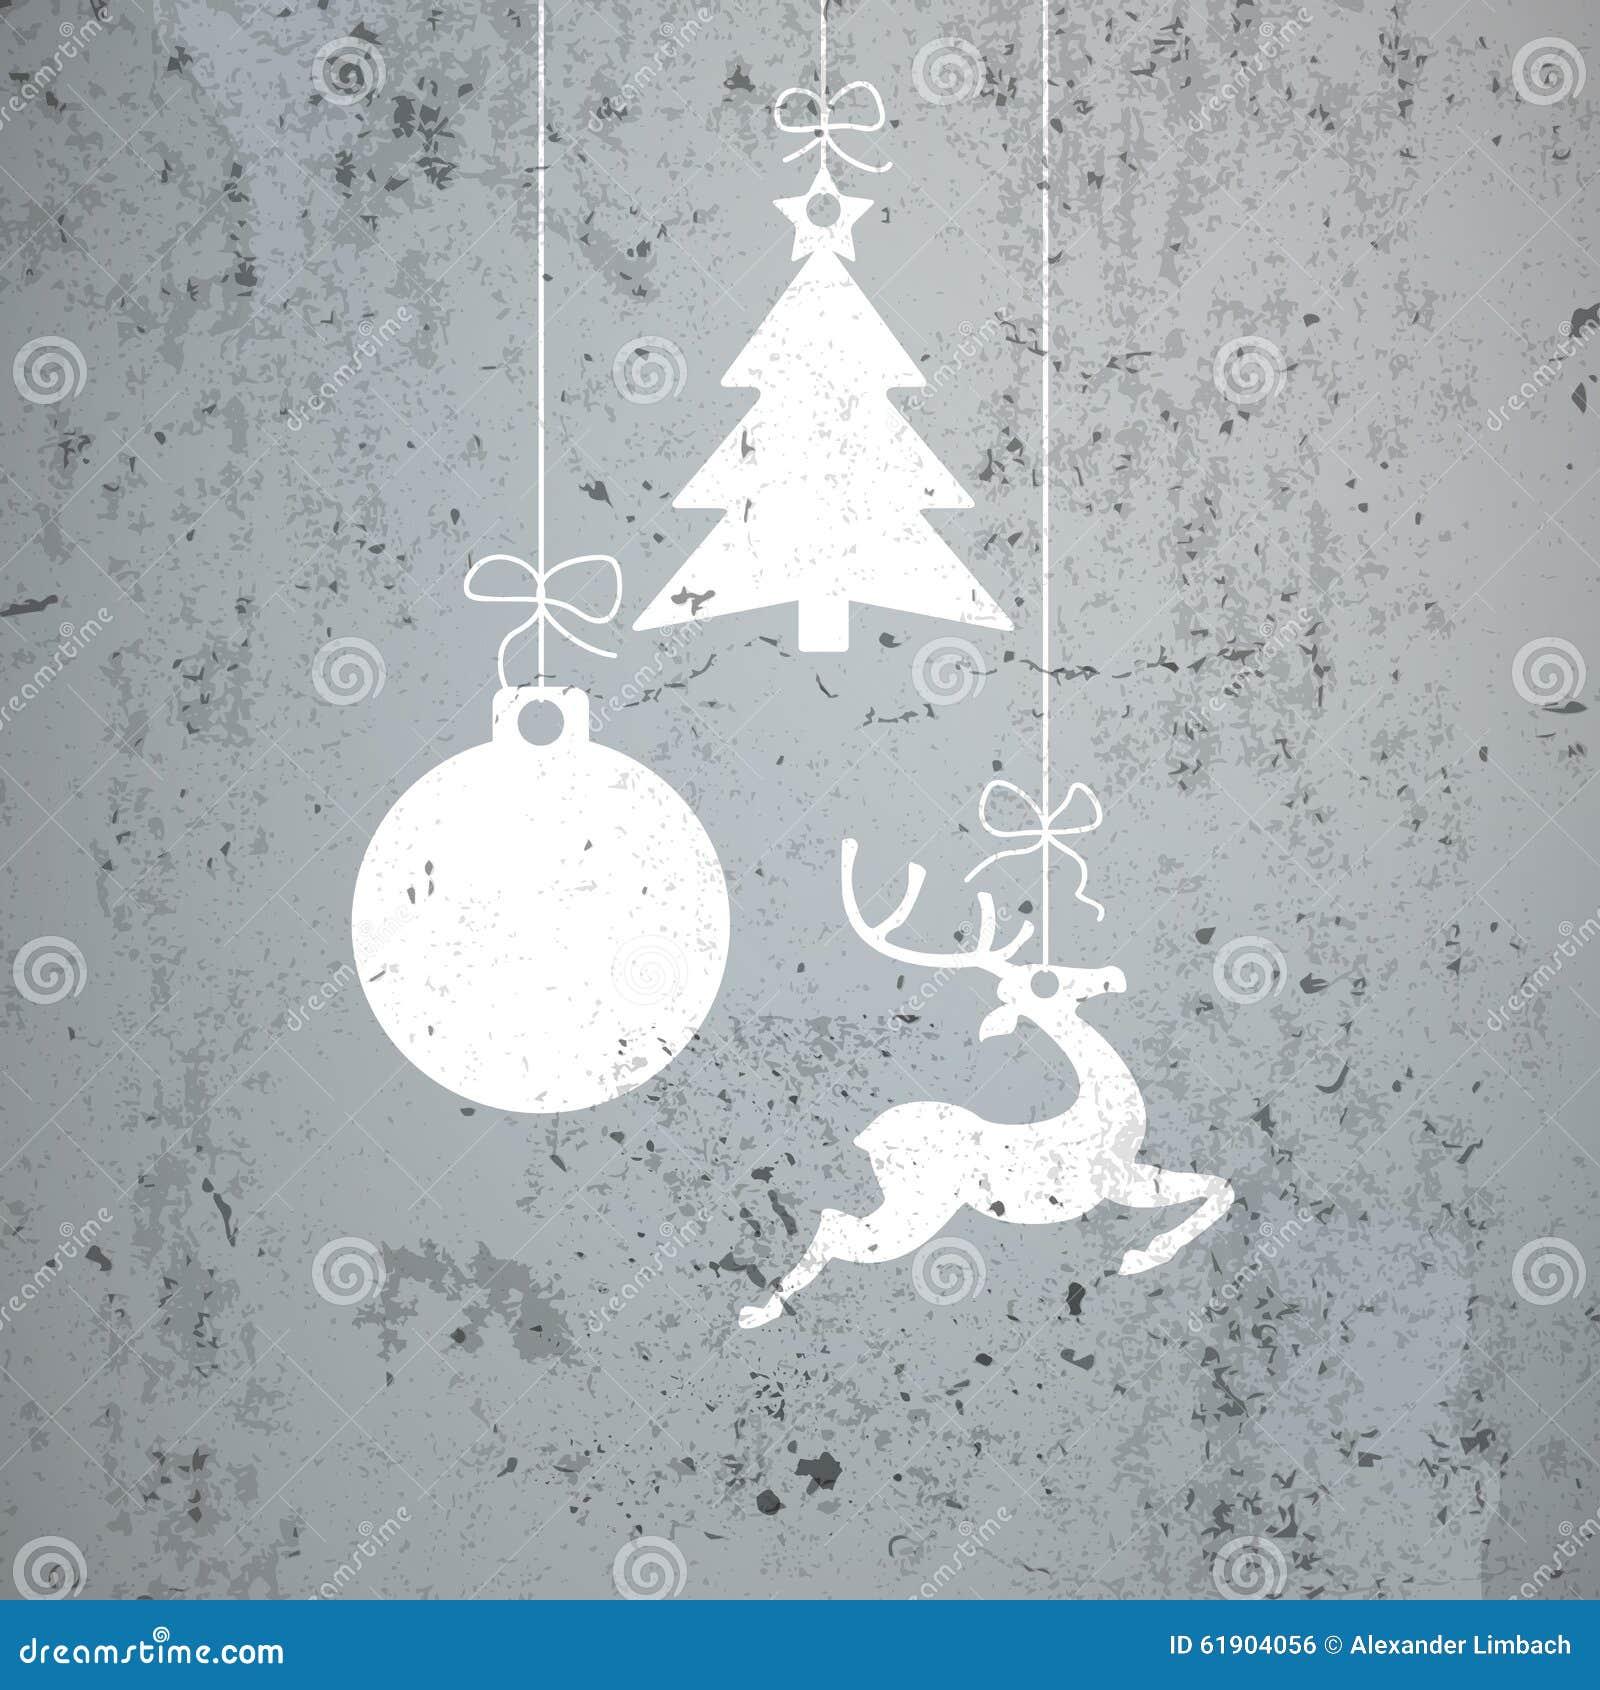 A Celebration Of Concrete: Concrete Christmas Card Stock Illustration. Illustration